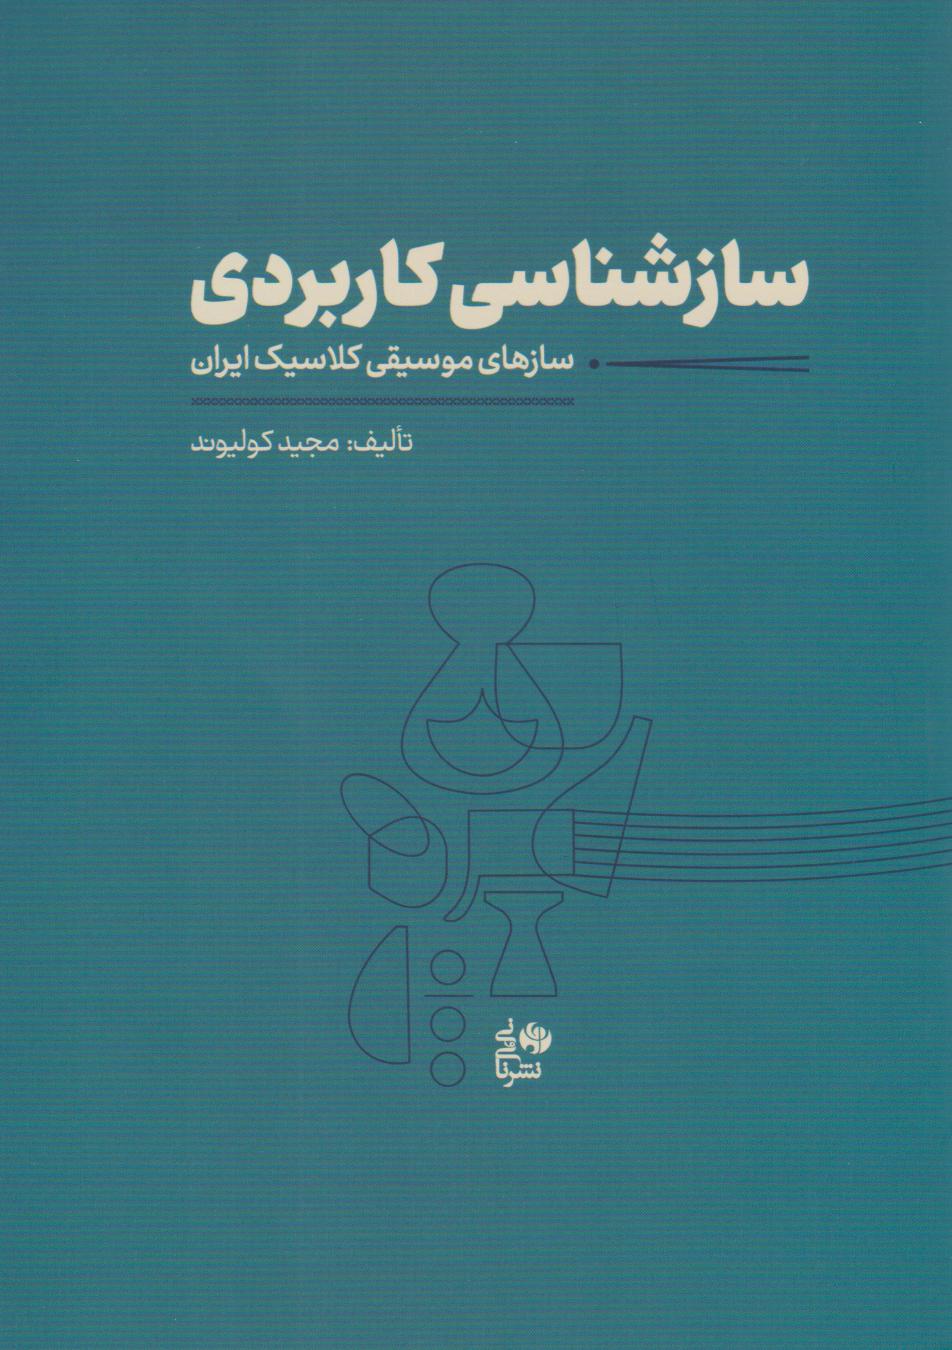 کتاب سازشناسی کاربردی مجید کولیوند انتشارات نایونی